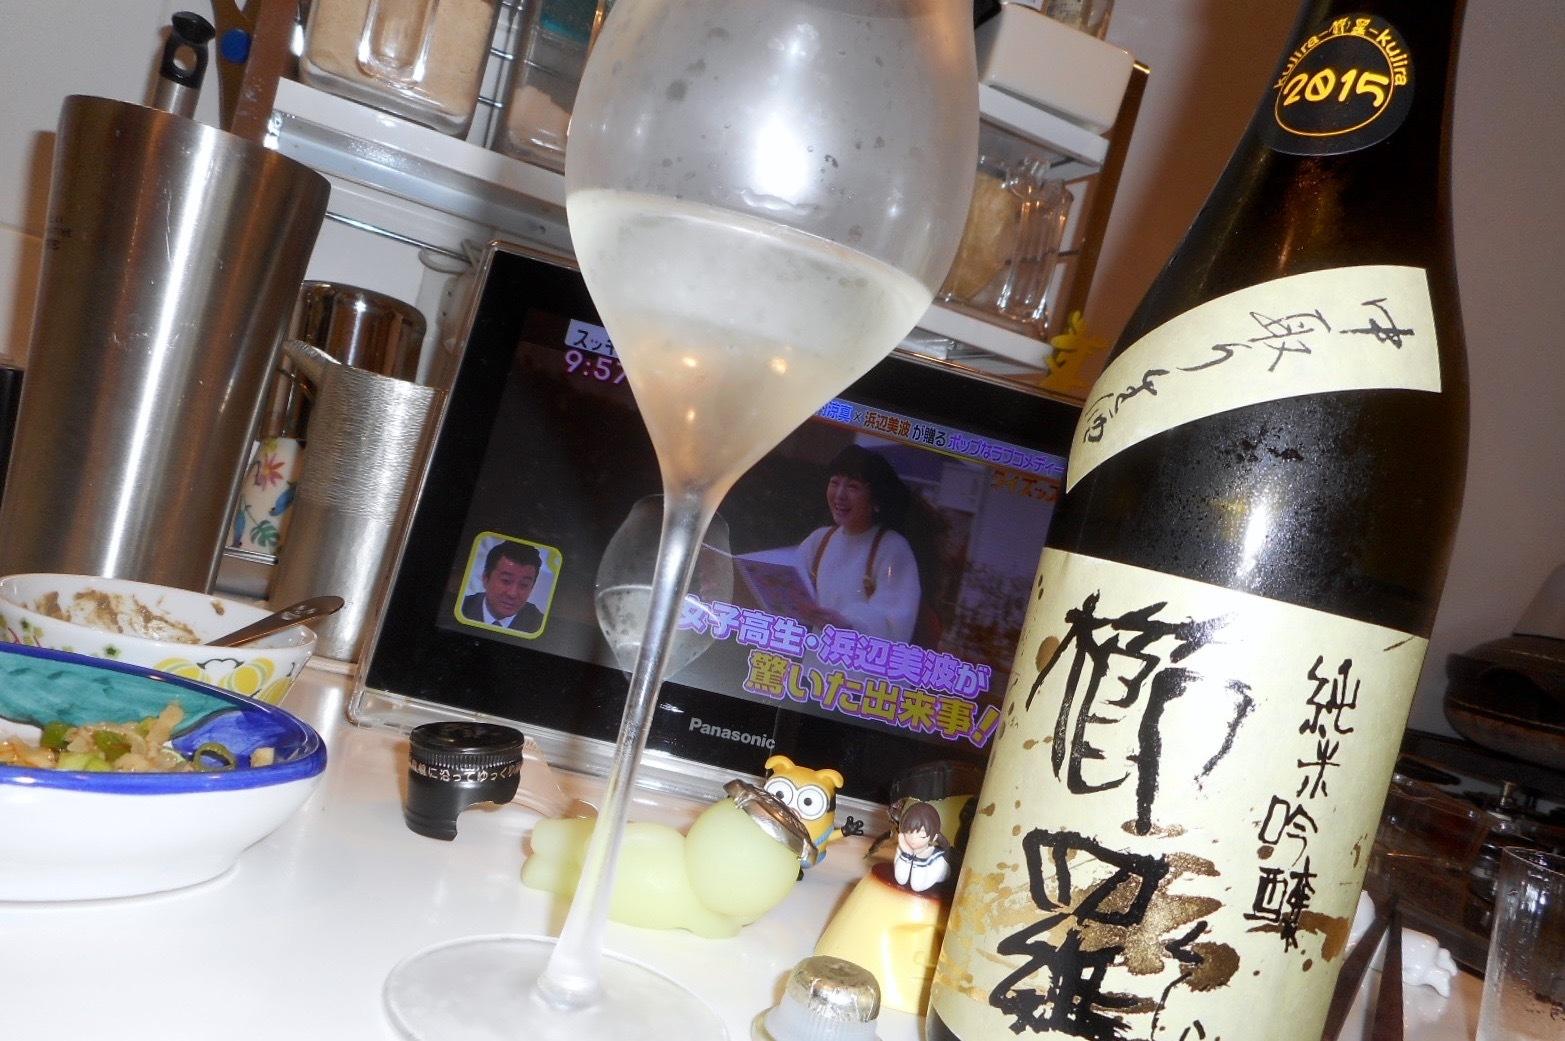 kujira2015_2_7.jpg